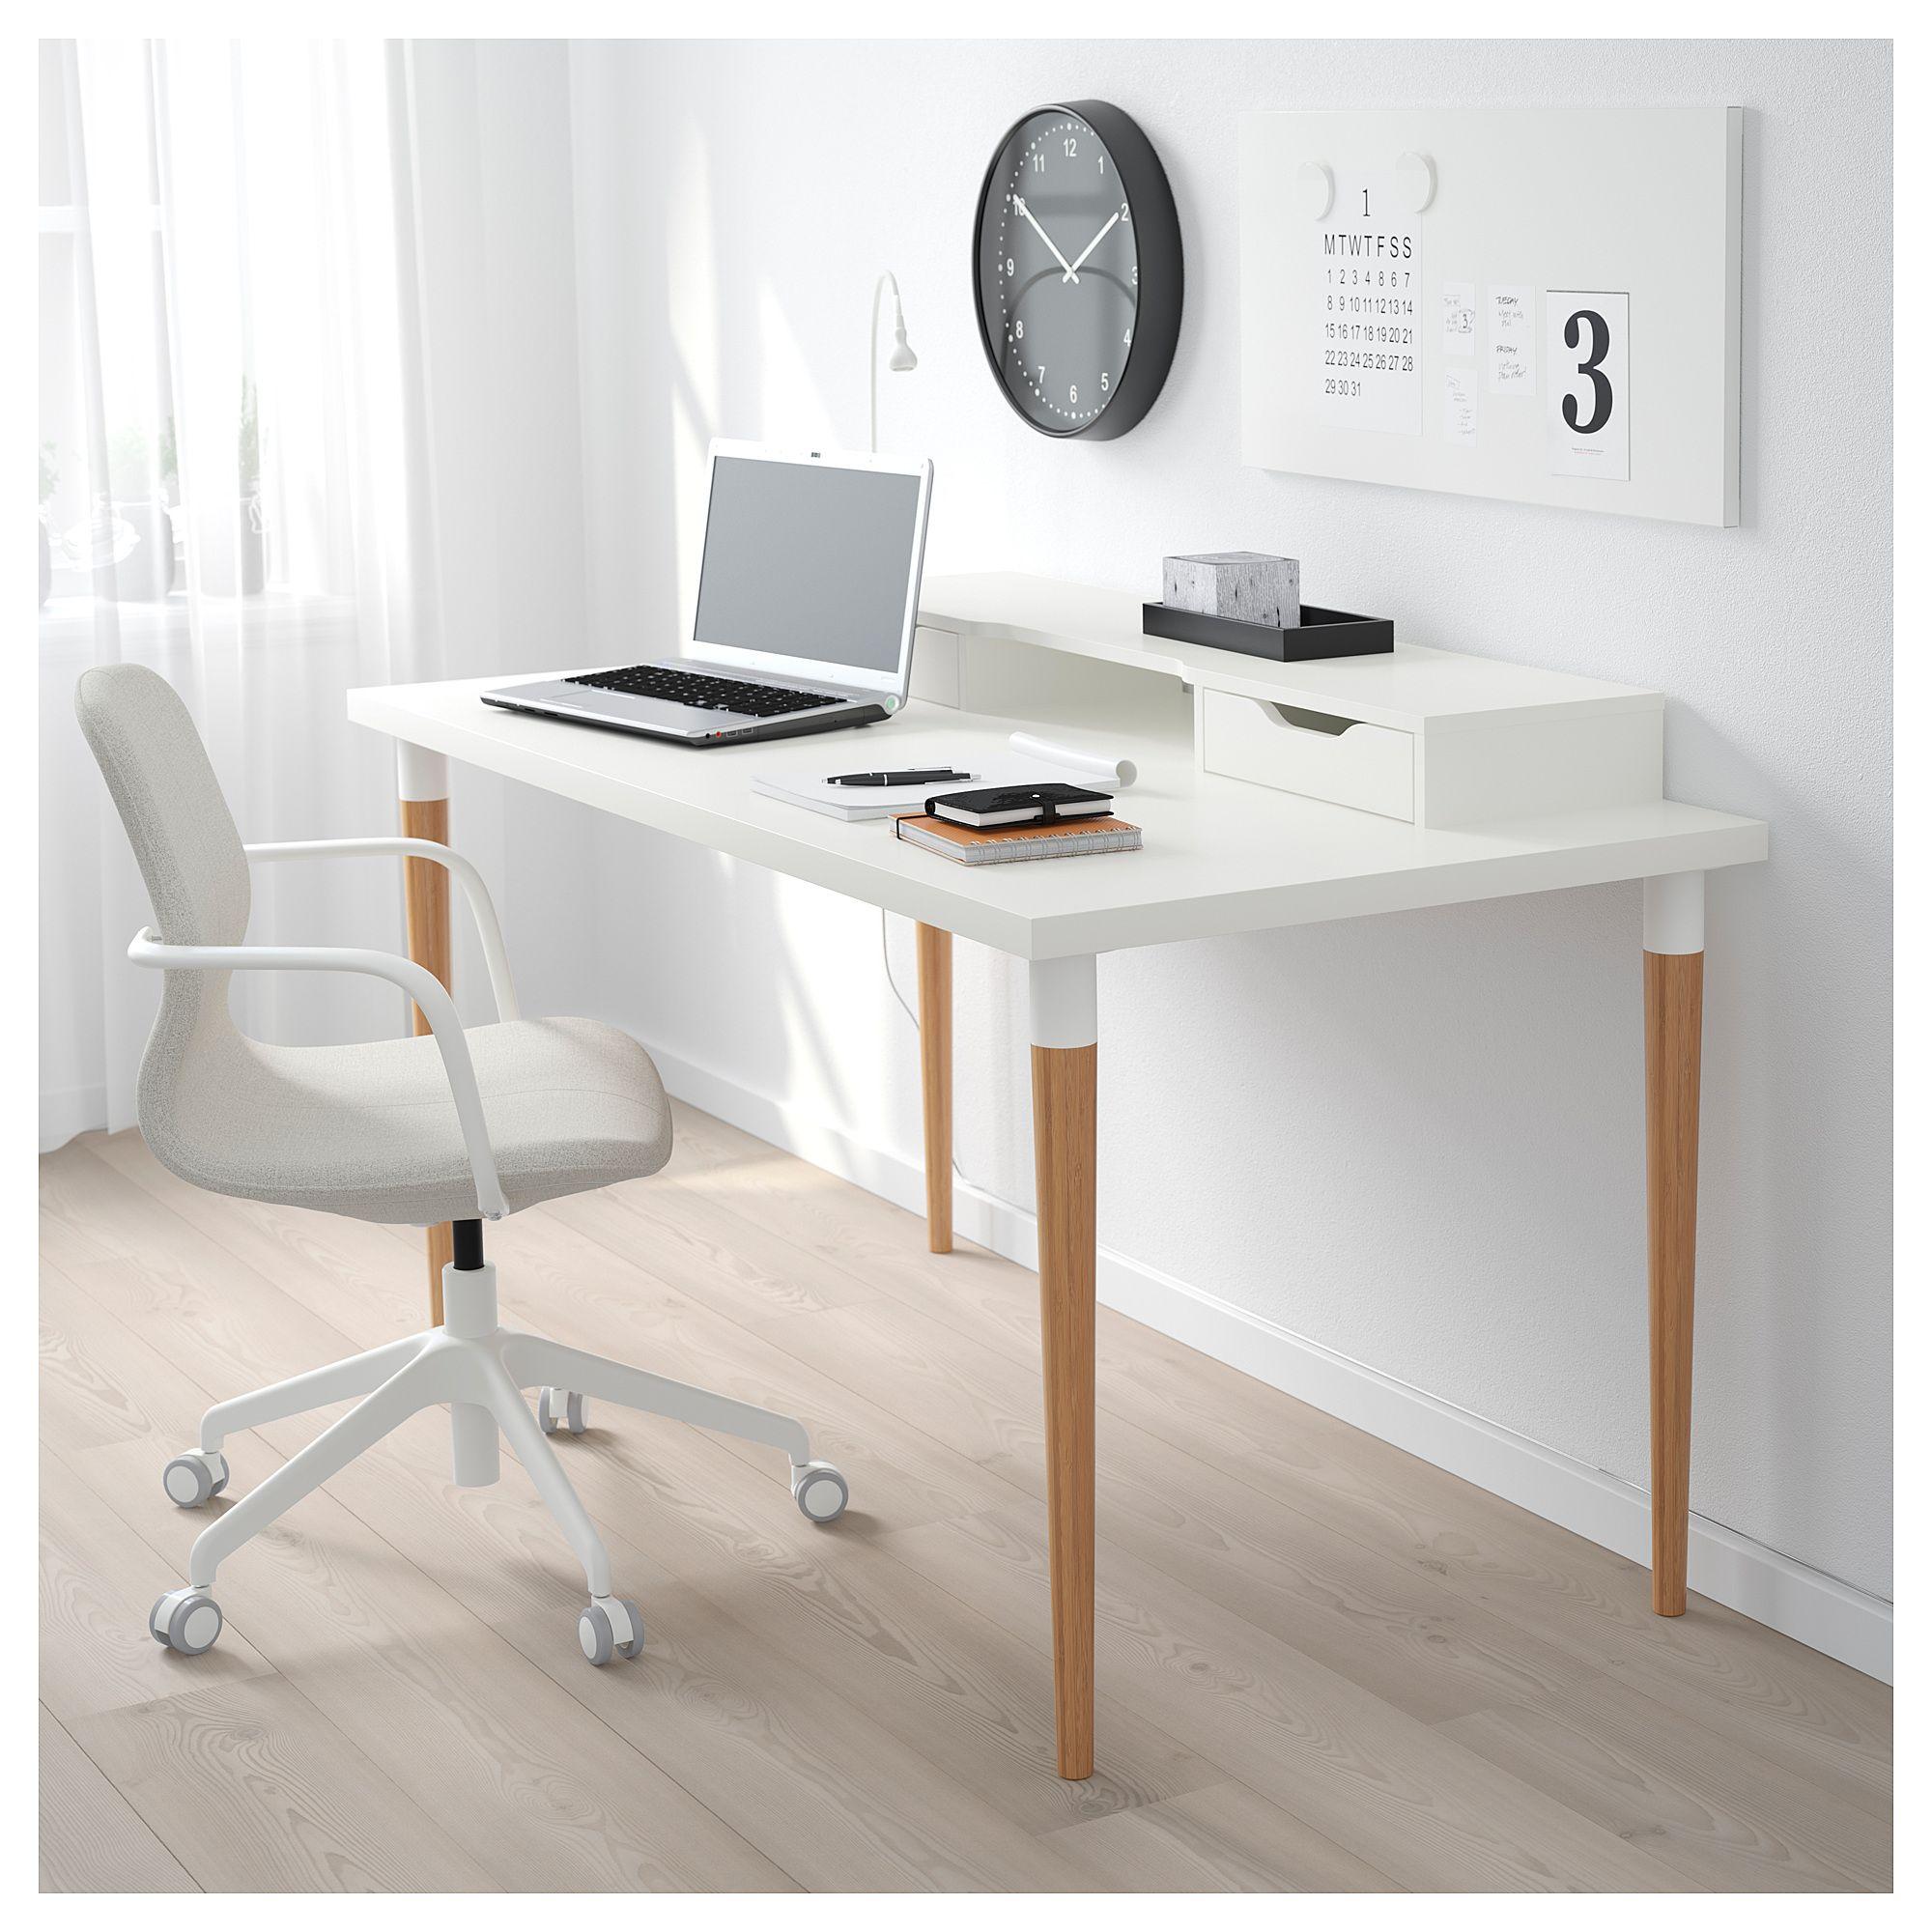 Ikea linnmon hilver table white bamboo en 2019 products home office desks ikea table y - Ikea plateau bureau ...